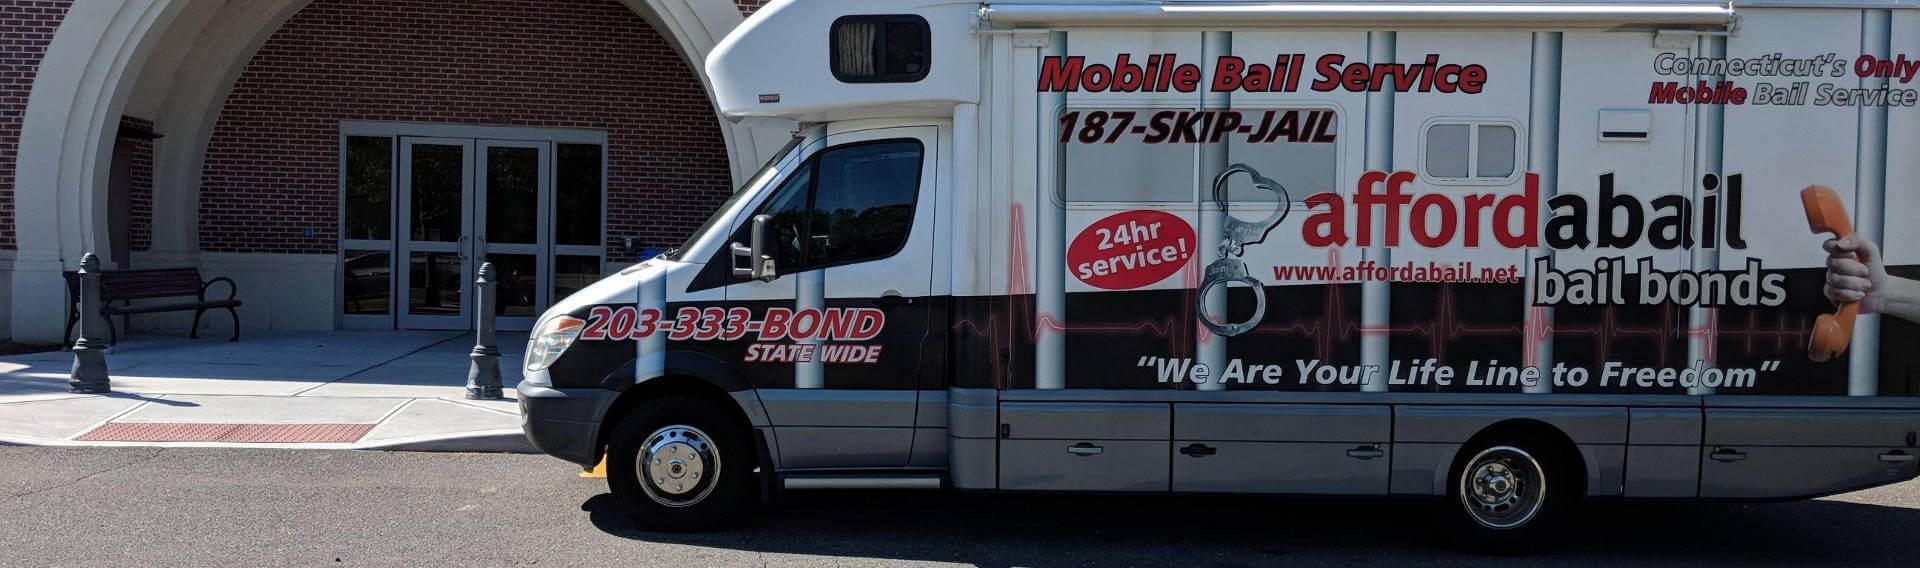 Mobile bail bonds service in Farmington, CT